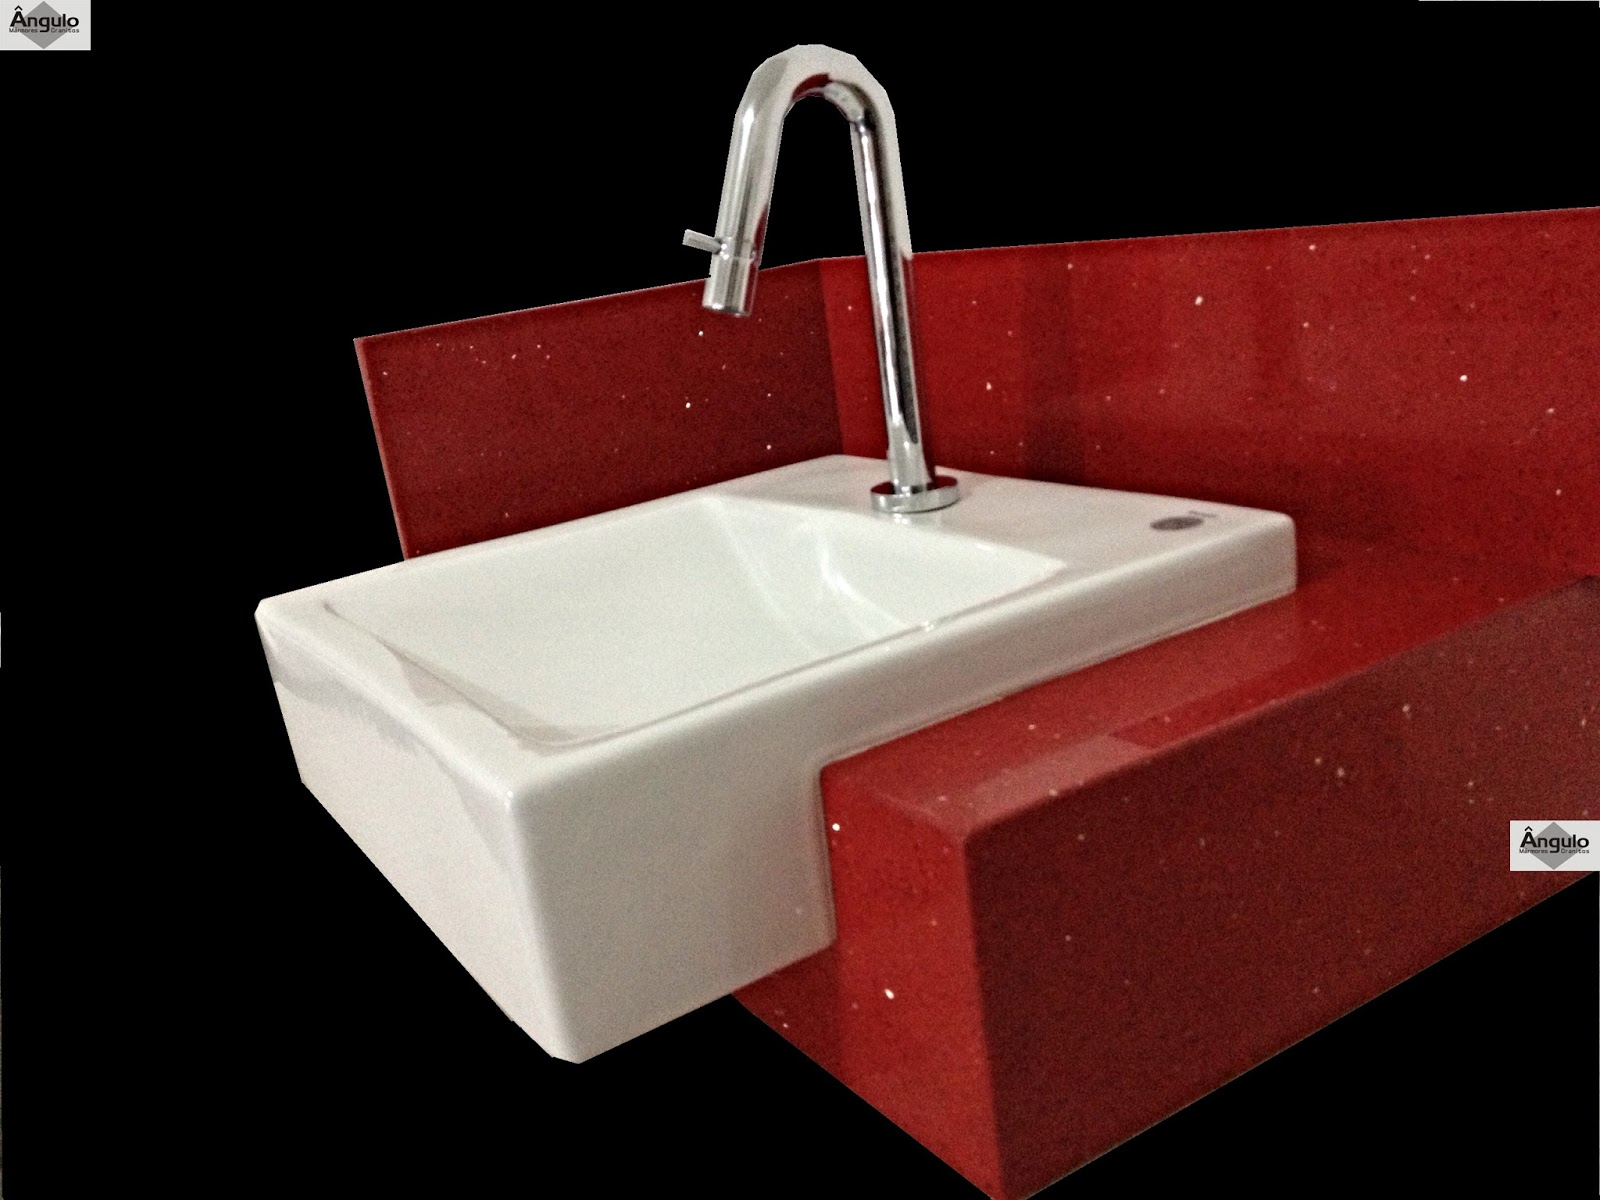 Mármores e Granitos: Bancada Banheiro Silestone Vermelho Stellar #080101 1600x1200 Bancada Banheiro Silestone Vermelho